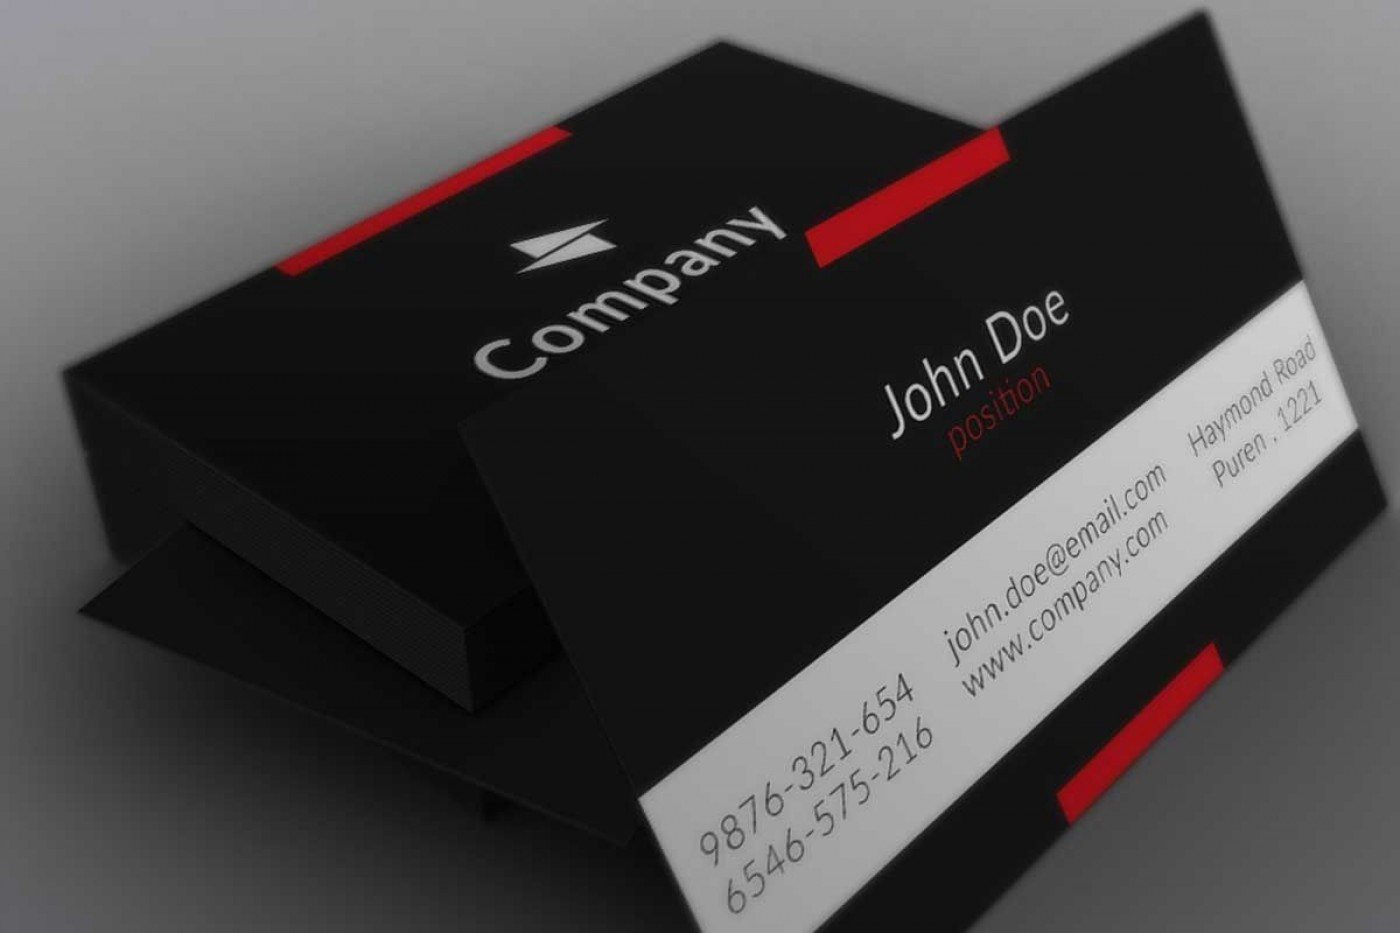 004 Impressive Free Adobe Photoshop Busines Card Template High Def  Download1400